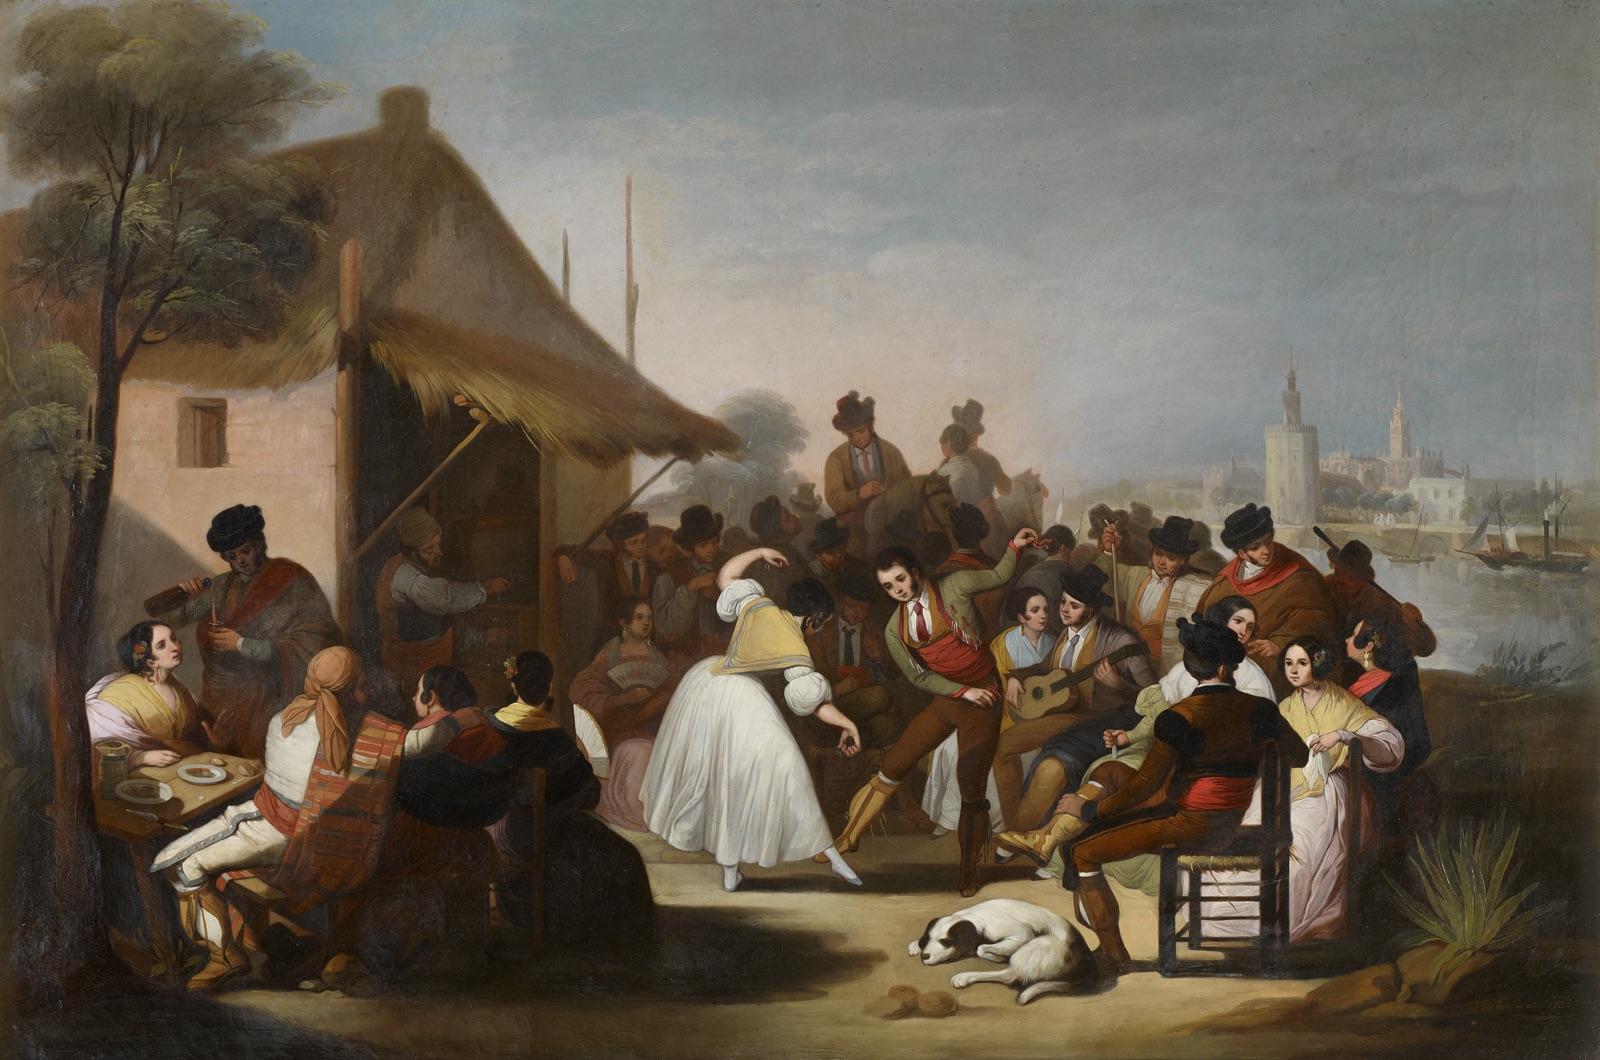 Un baile en Triana (1850), de Francisco de Paula Escribano Liñán